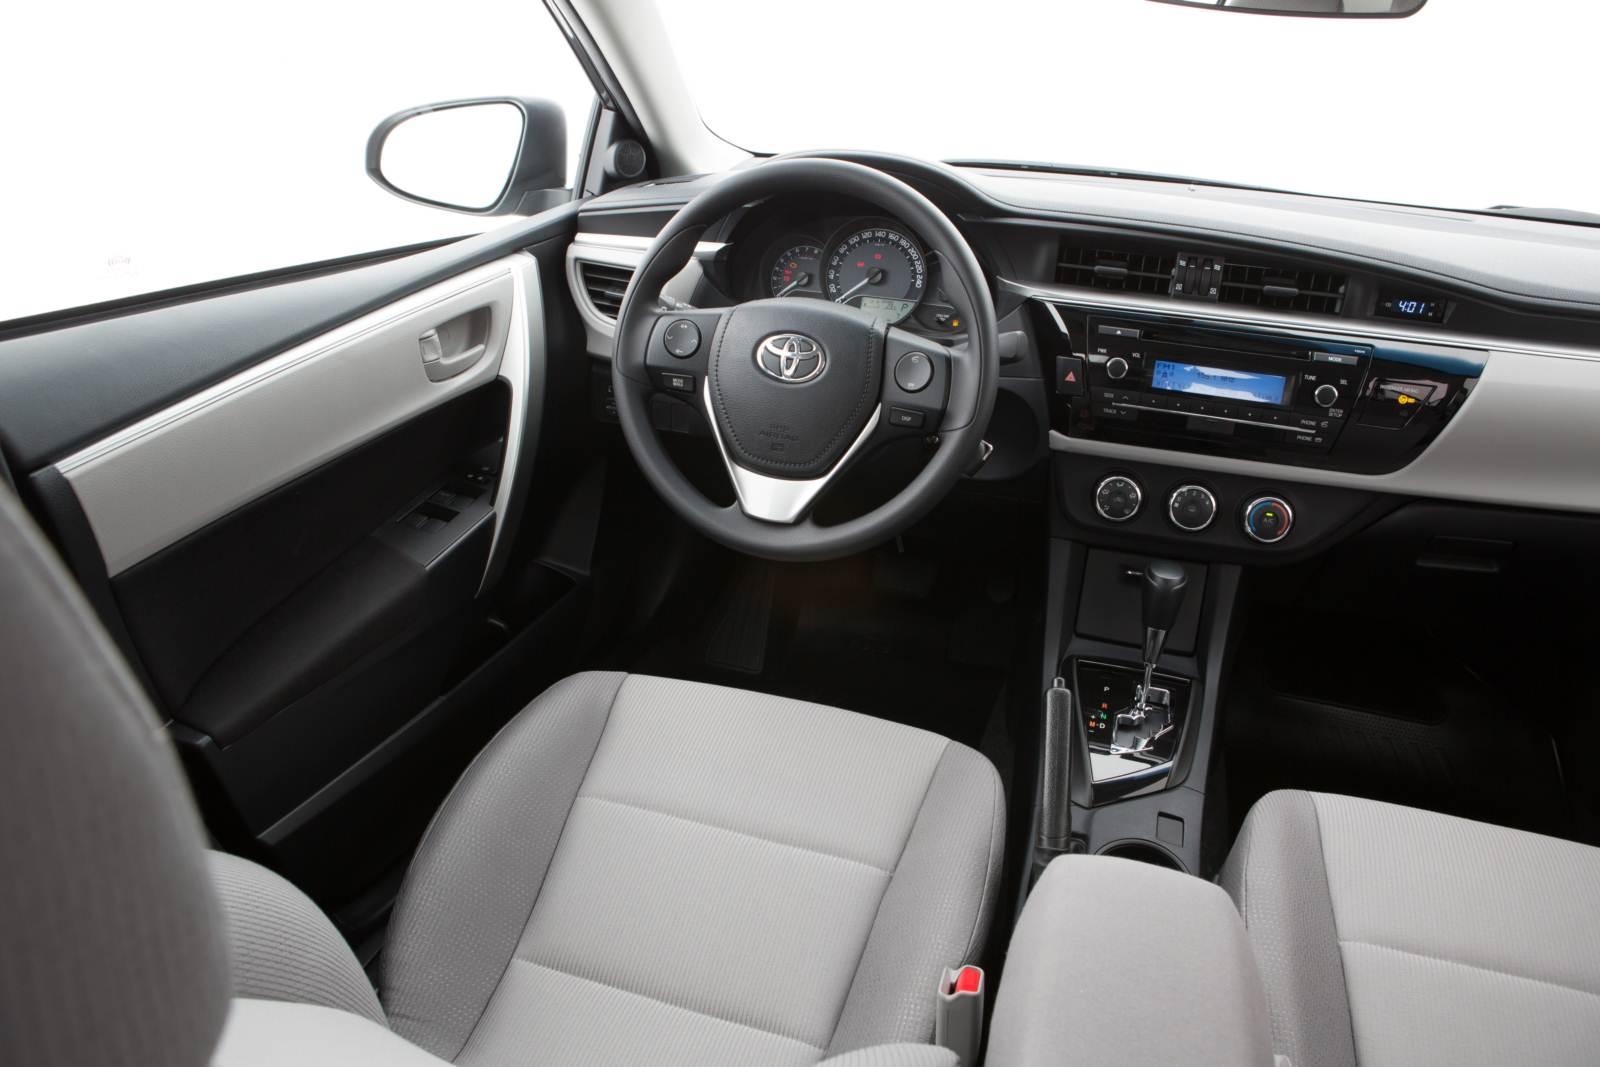 Top Novo Corolla Gli 1.8 2015 - interior - detalhe dos bancos revestidos  1600 x 1067 · 126 kB · jpeg